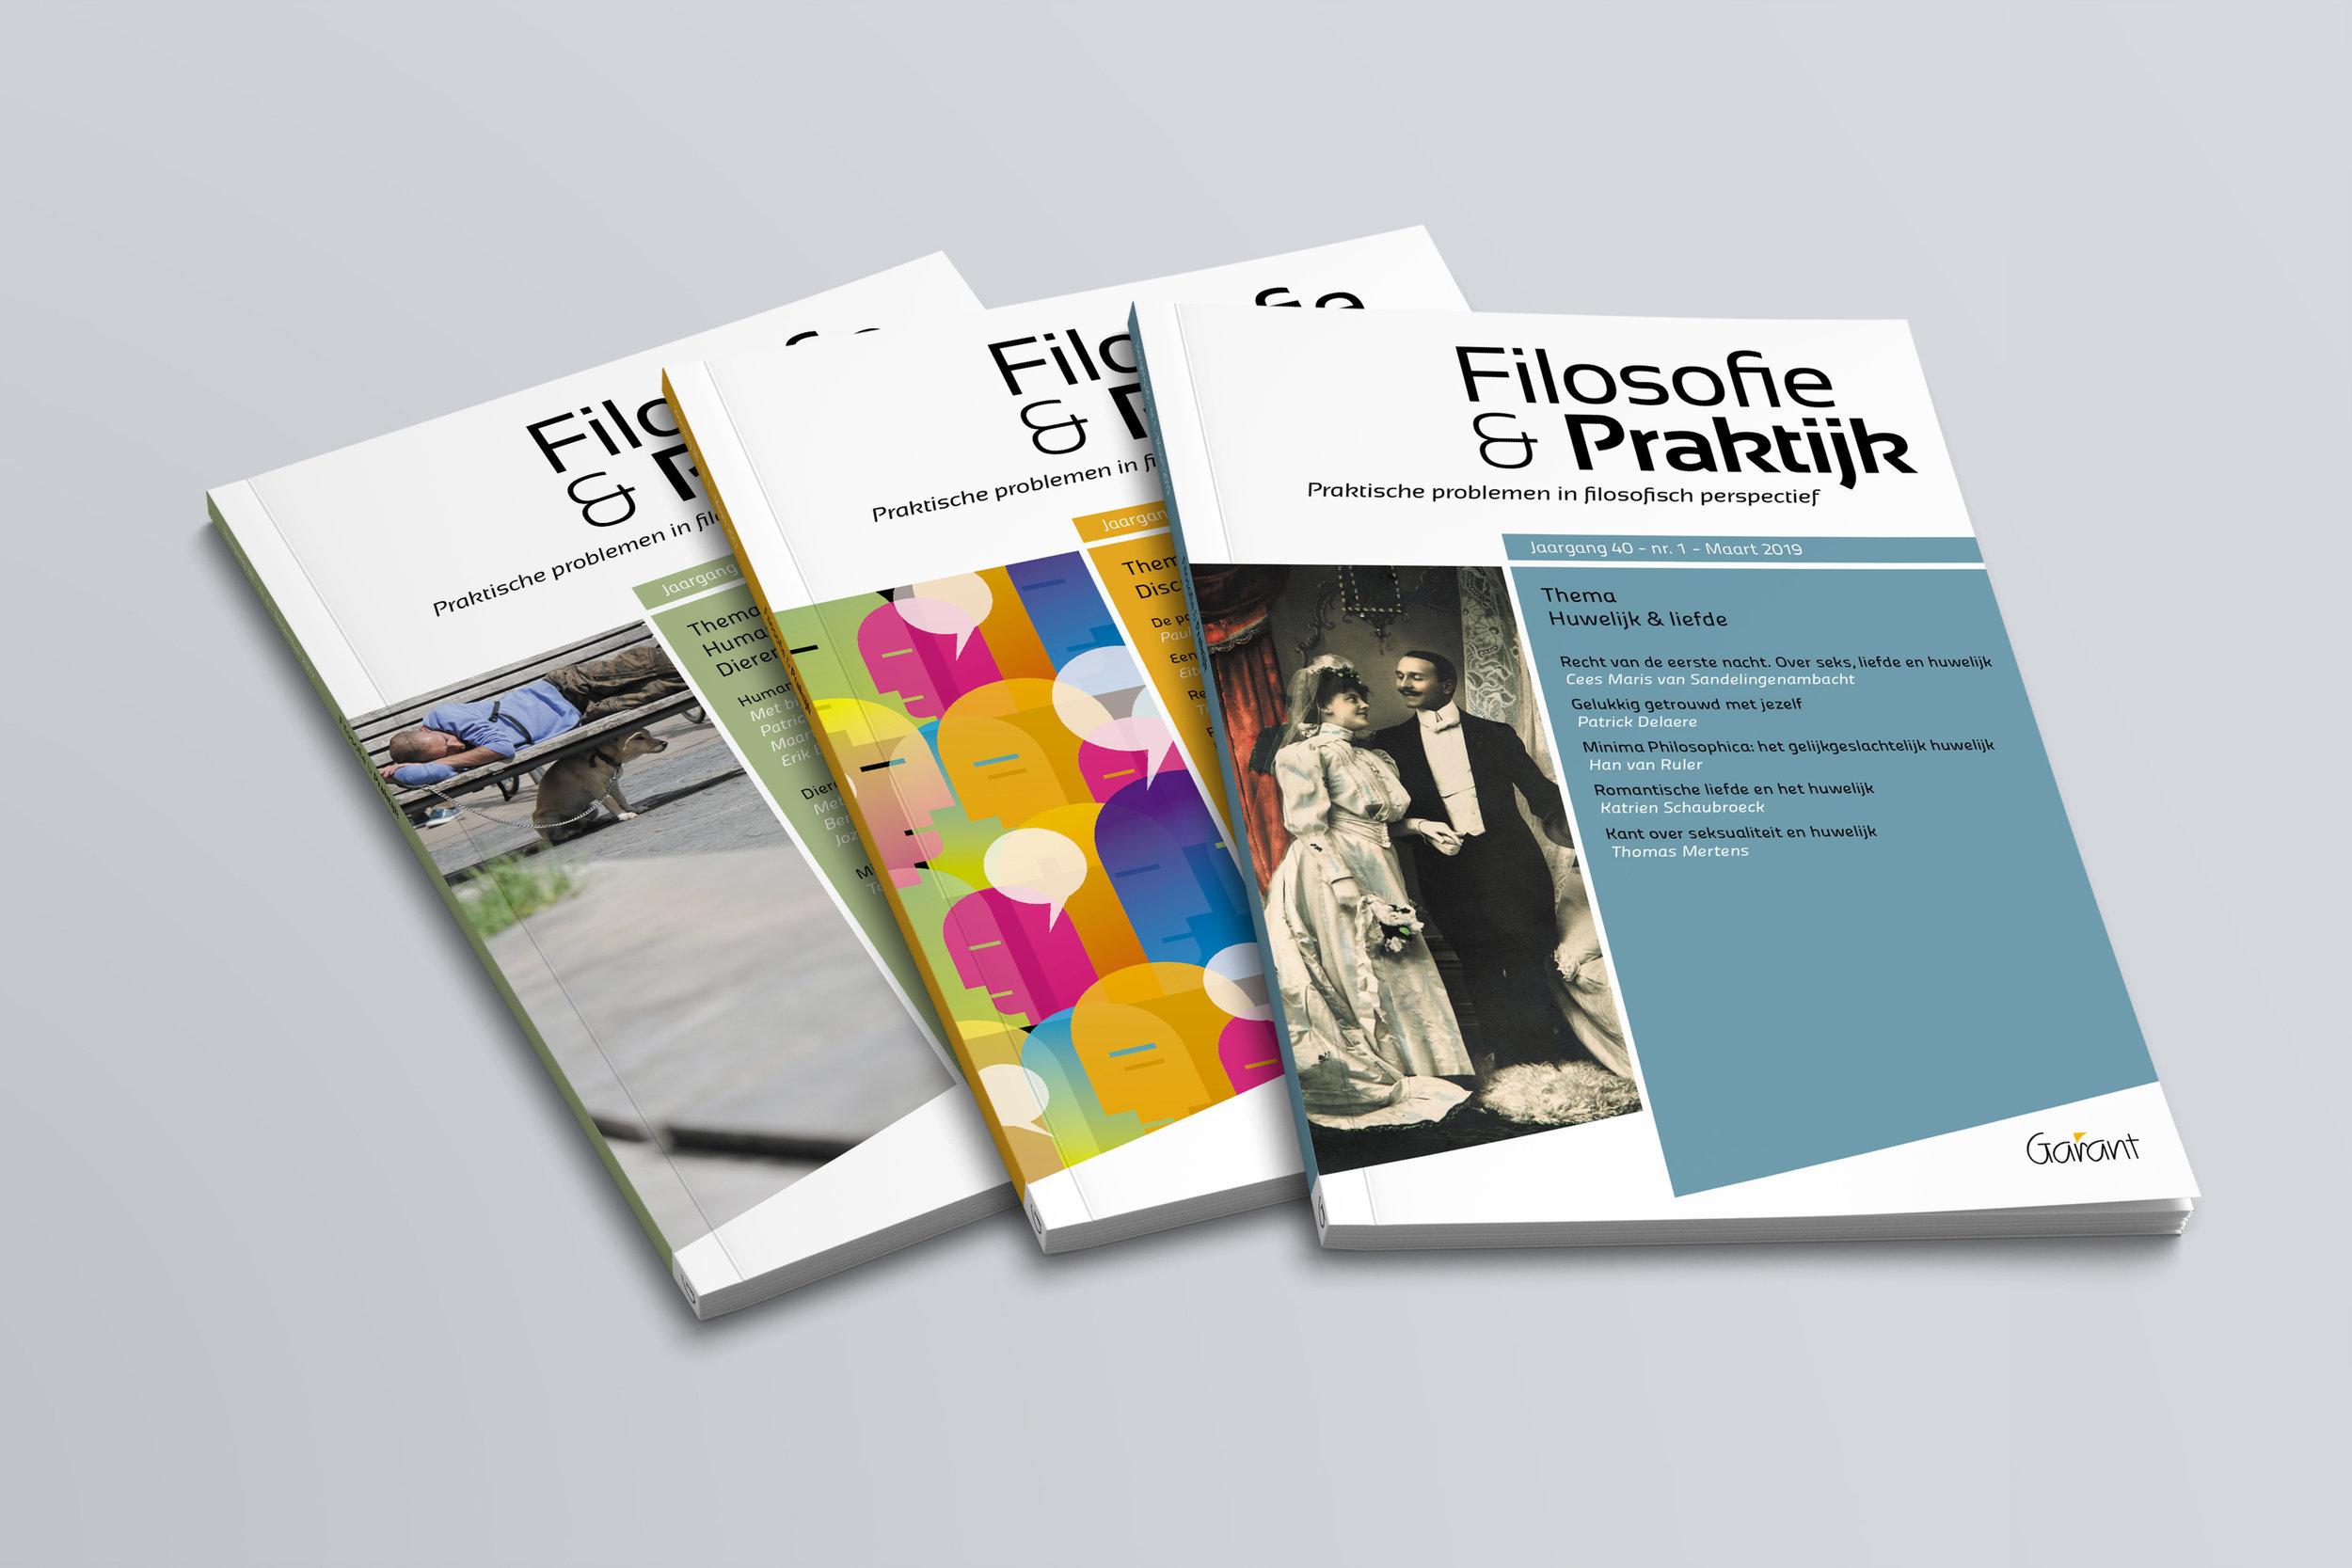 Filosofie & Praktijk